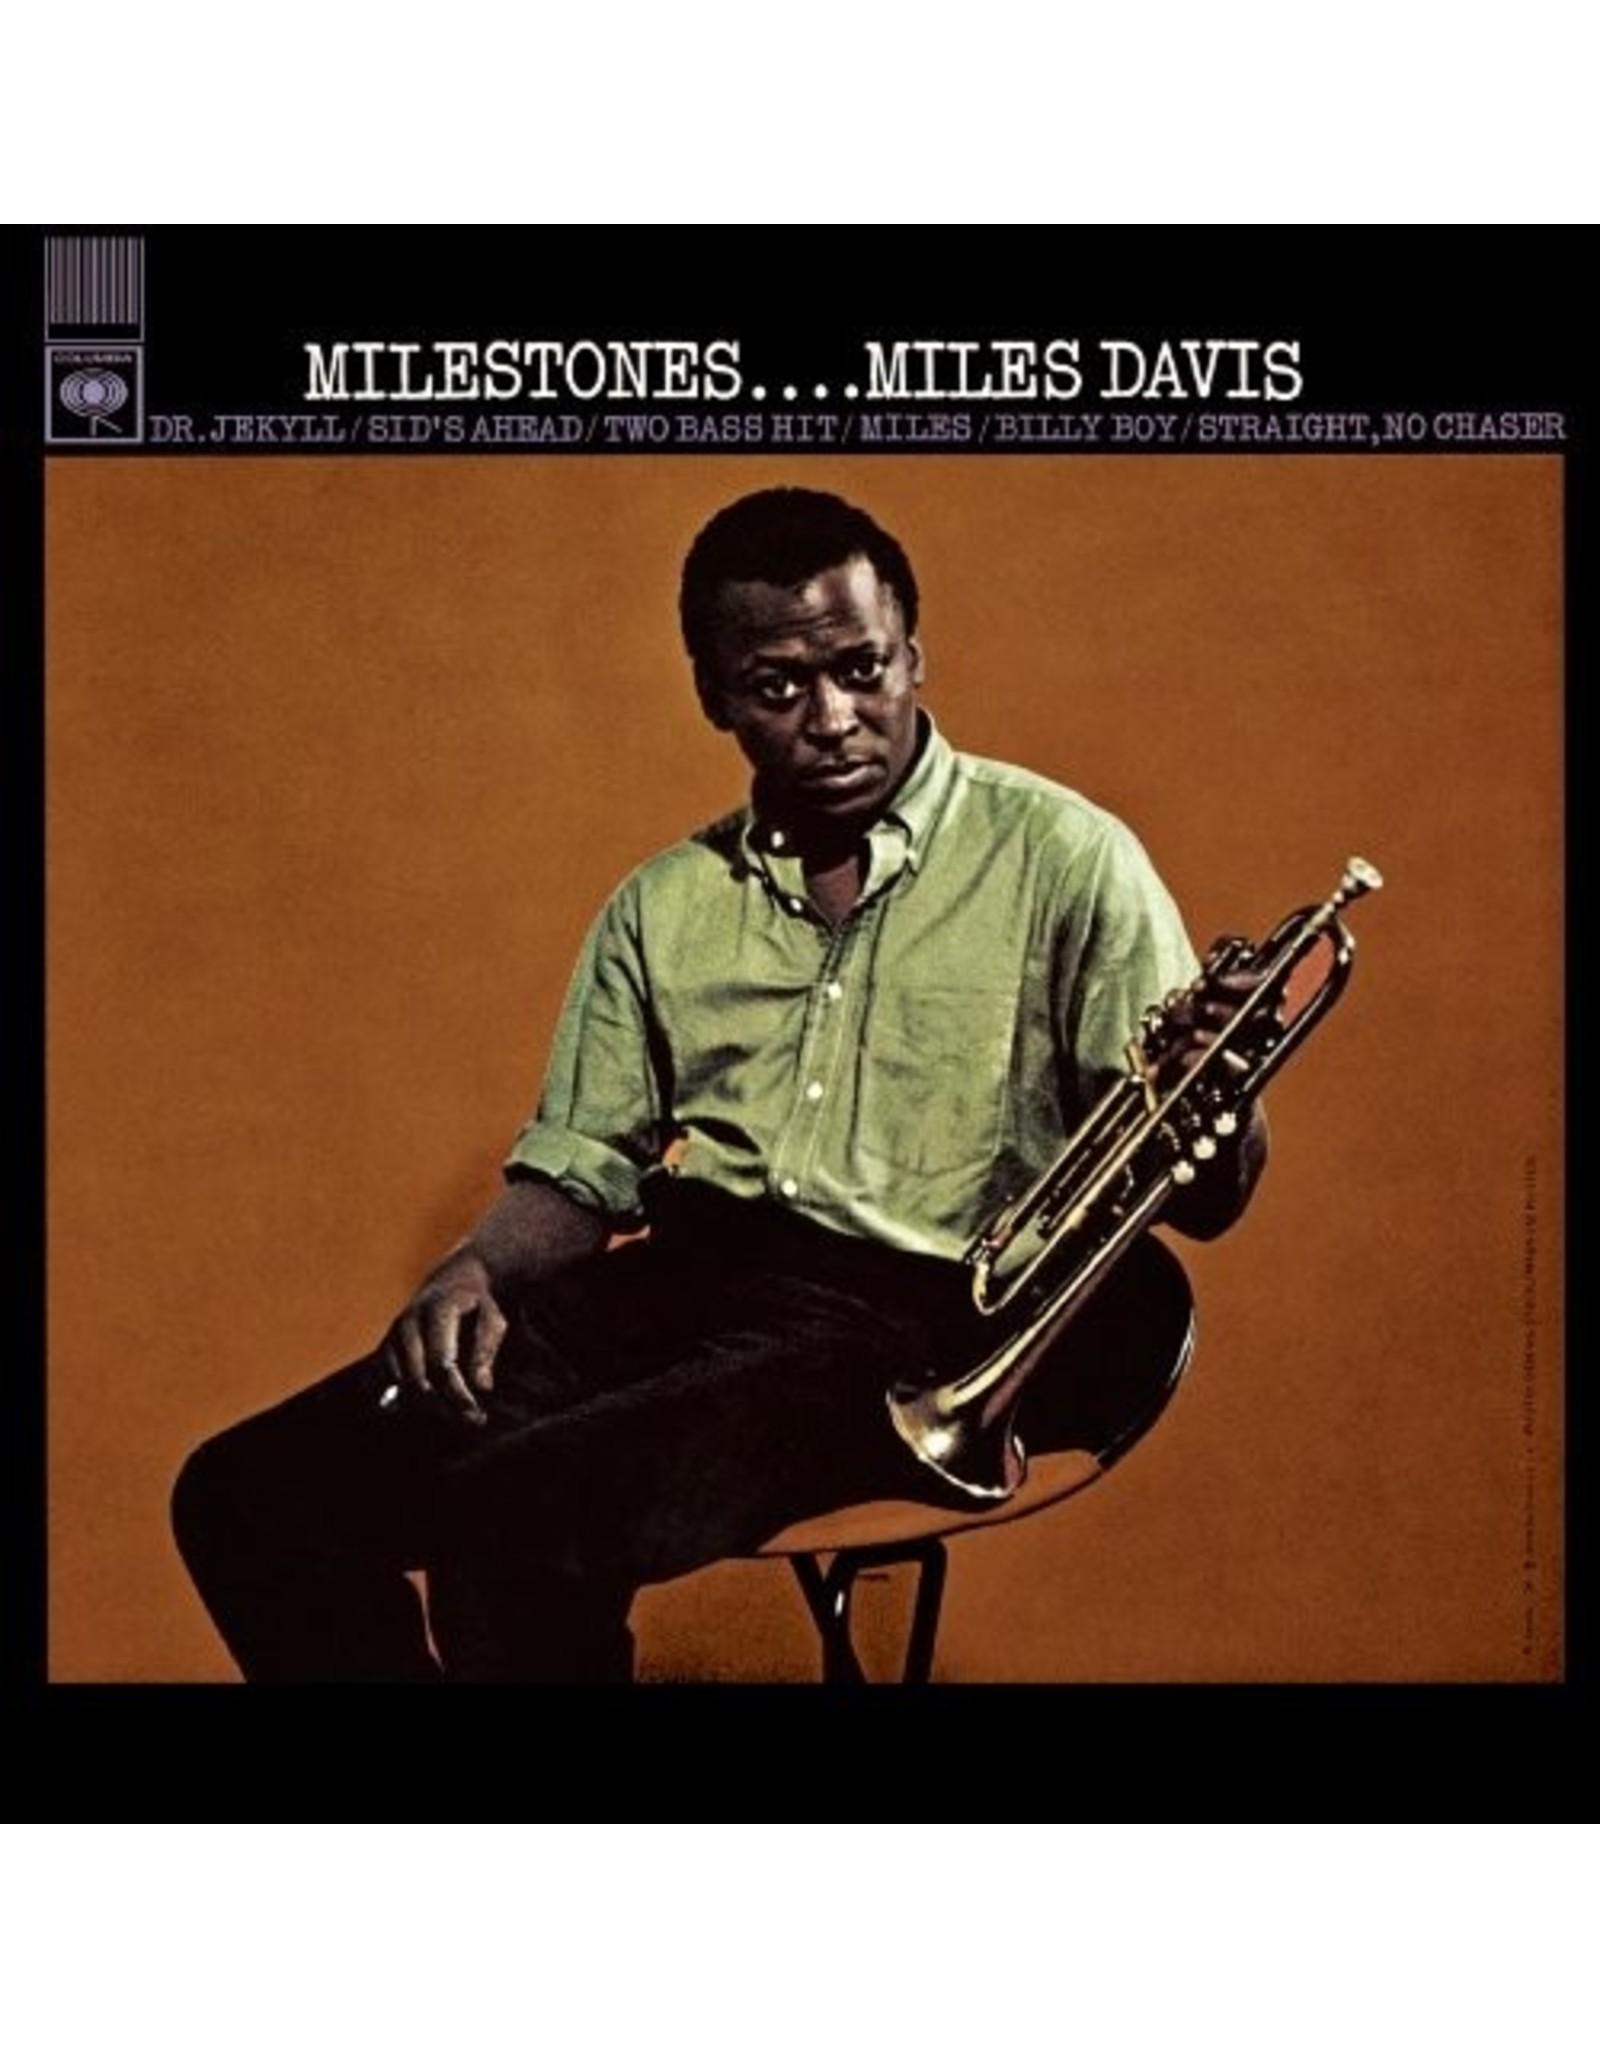 New Vinyl Miles Davis - Milestones LP